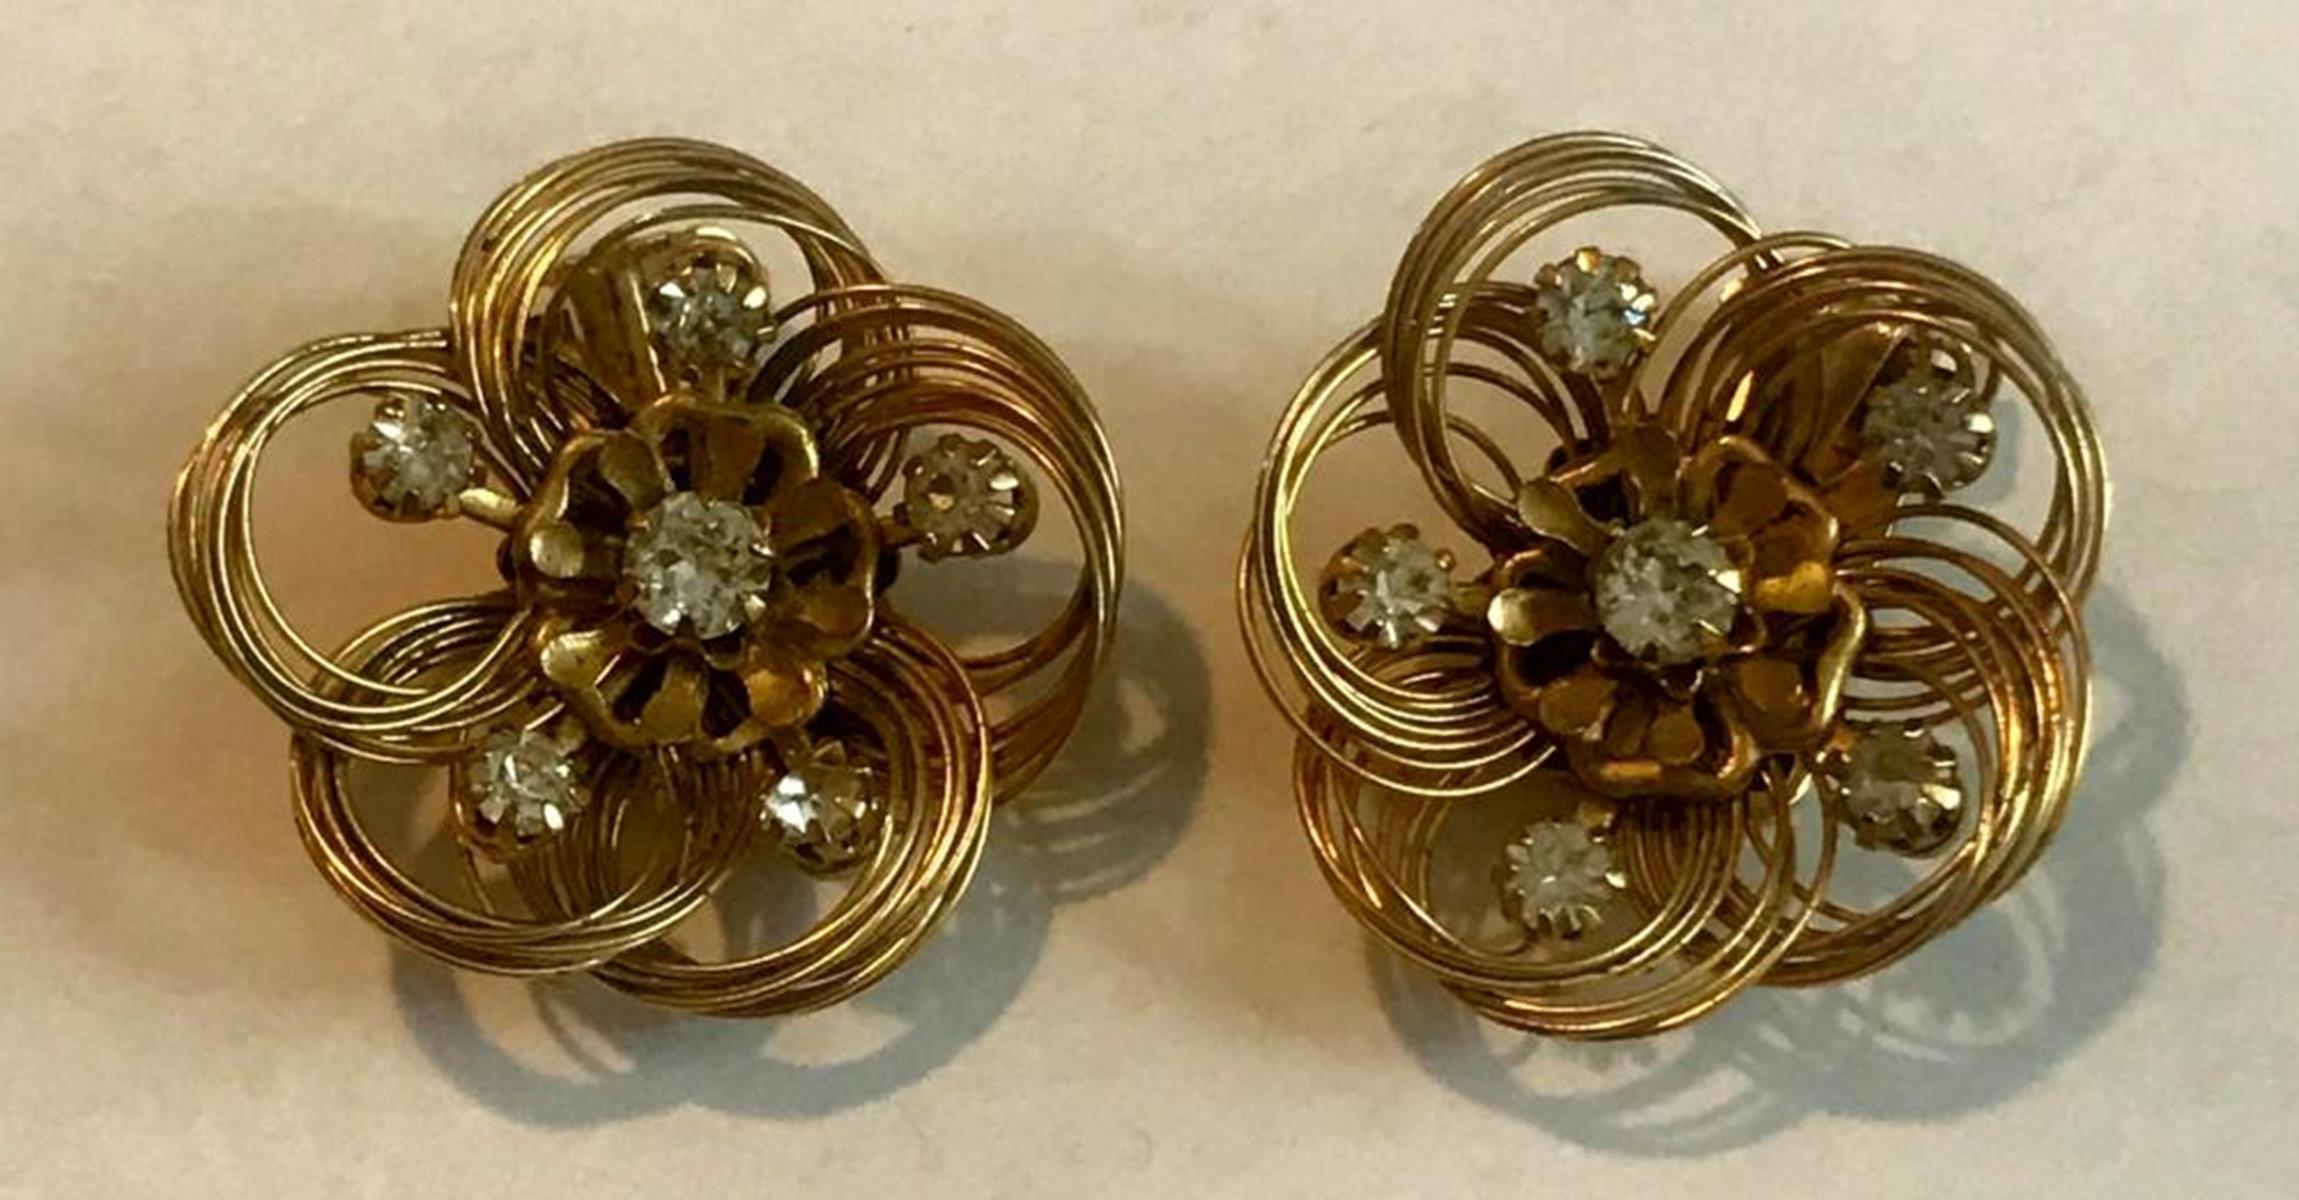 Vintage Signed Kramer Gold Tone Wire Flower Earrings W/ Rhinestone Accents